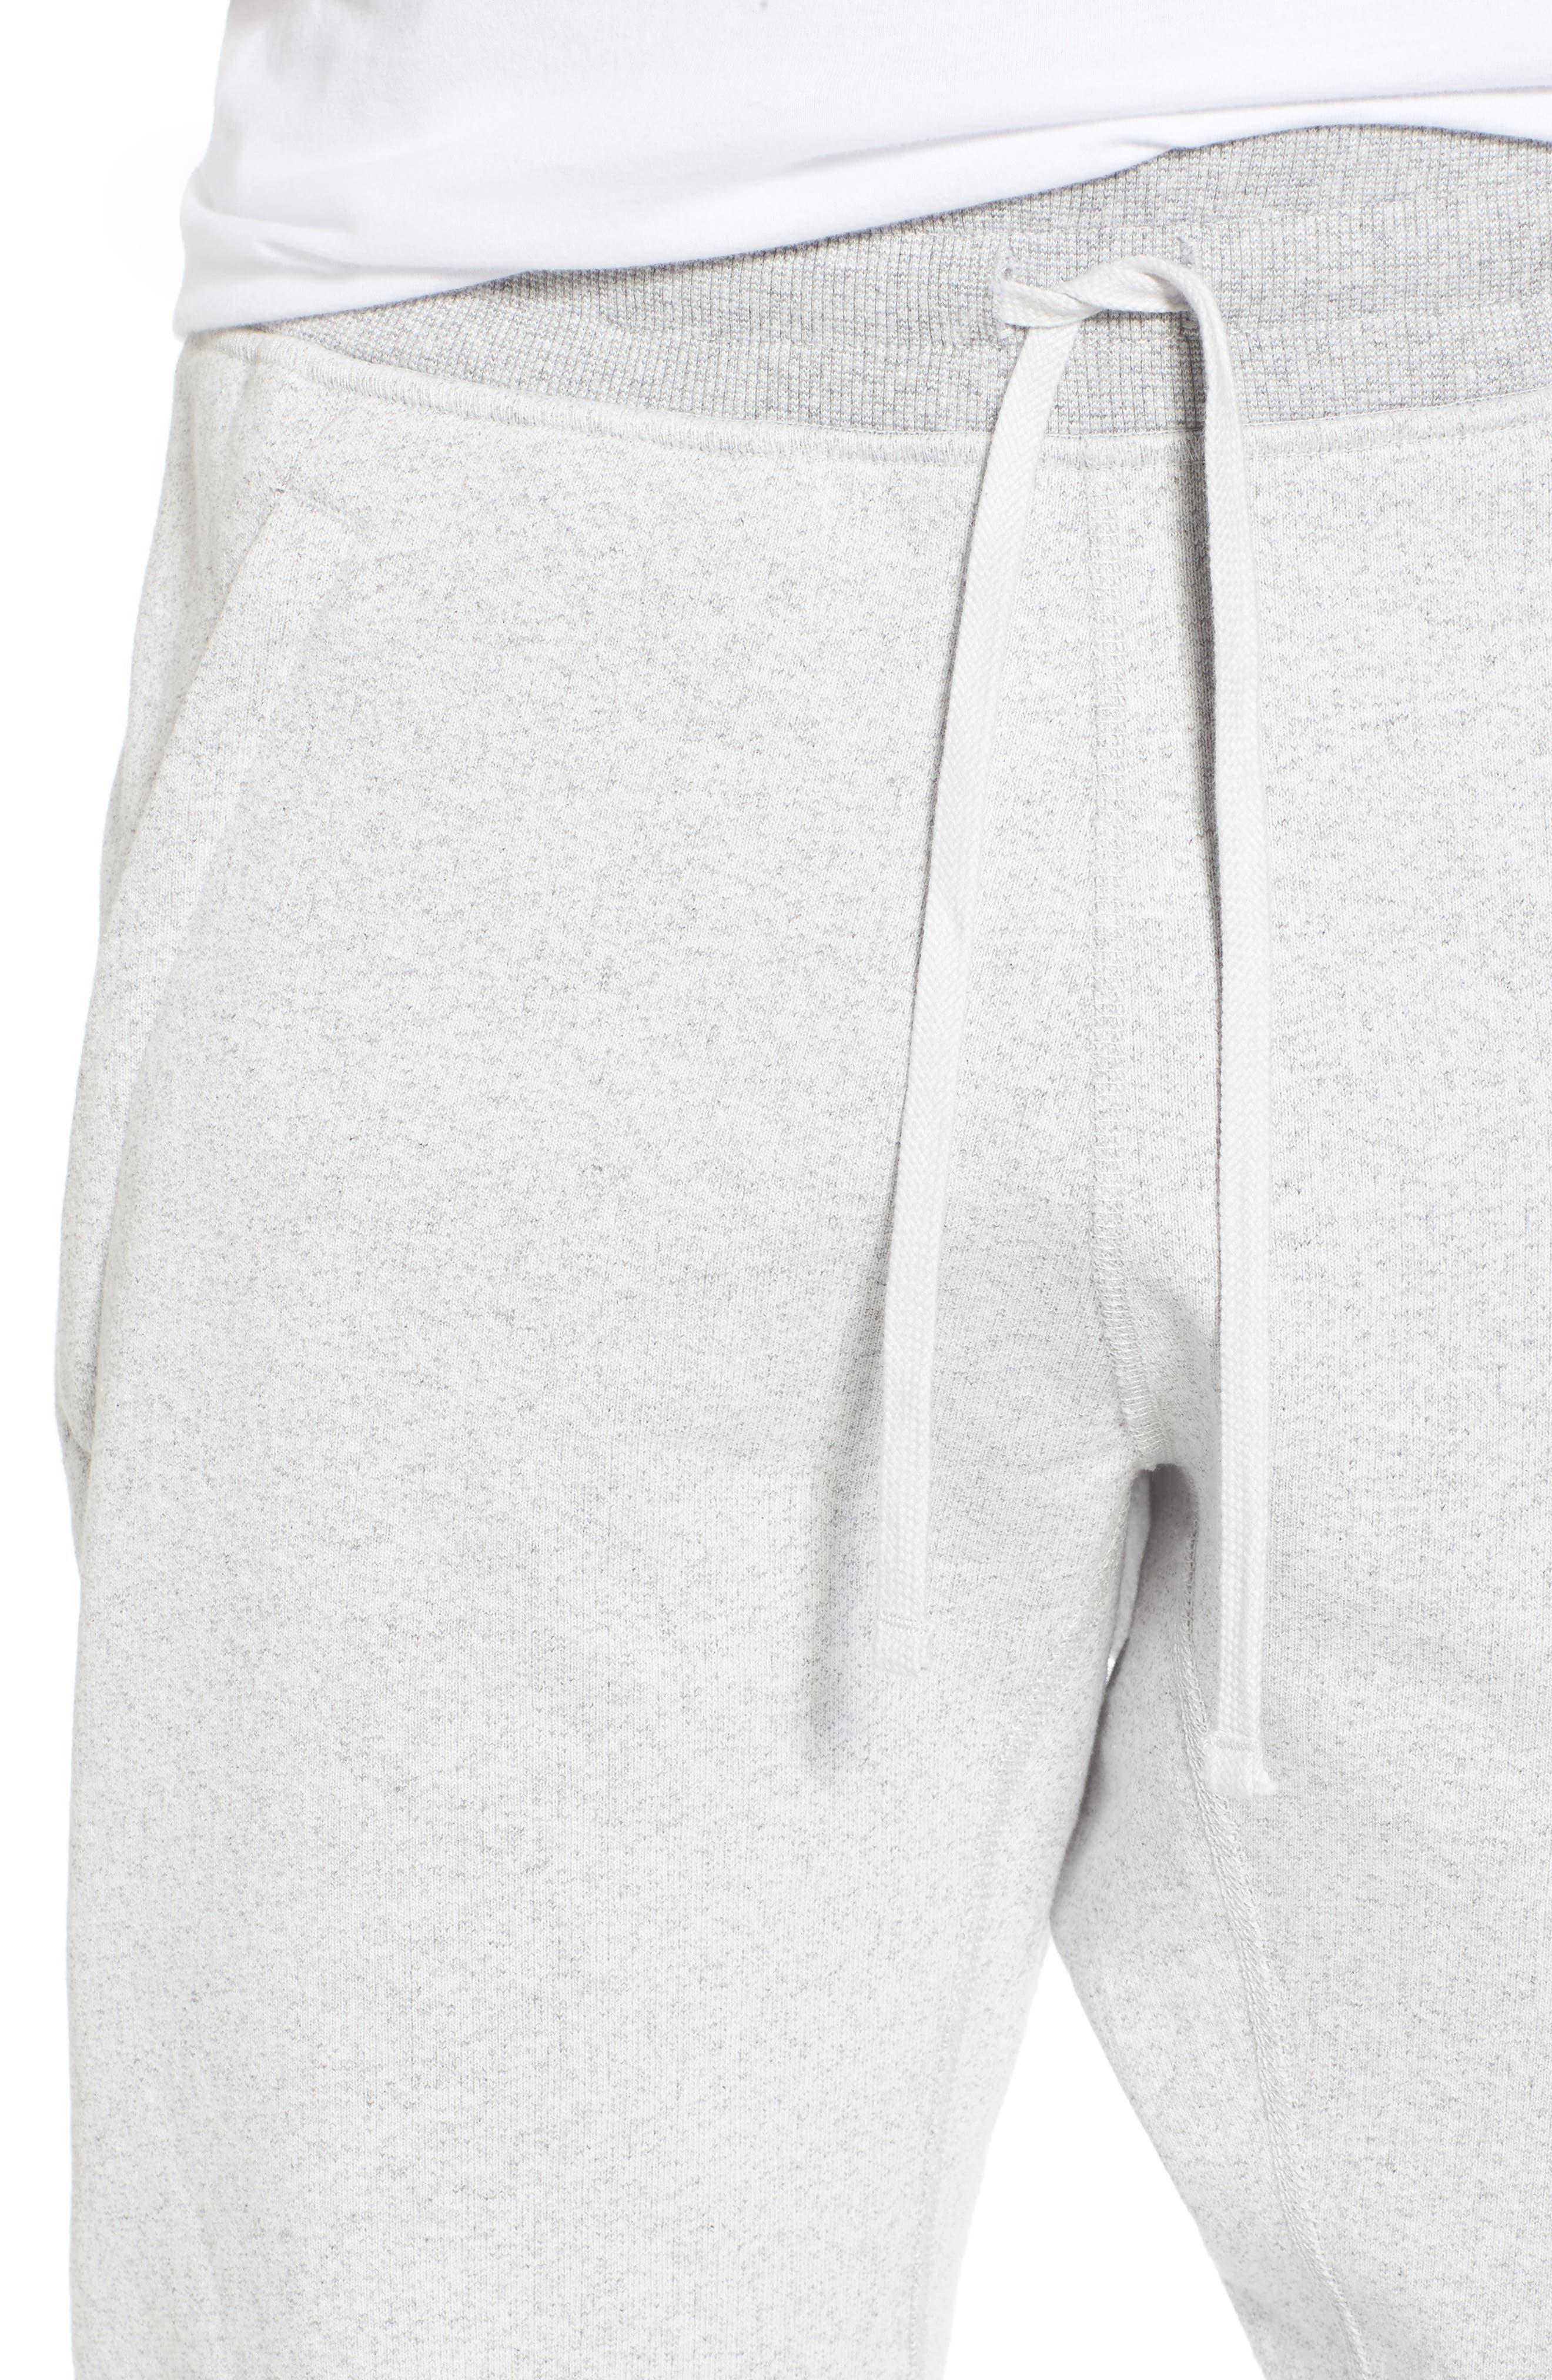 Slim Fit Heavyweight Sweatpants,                             Alternate thumbnail 4, color,